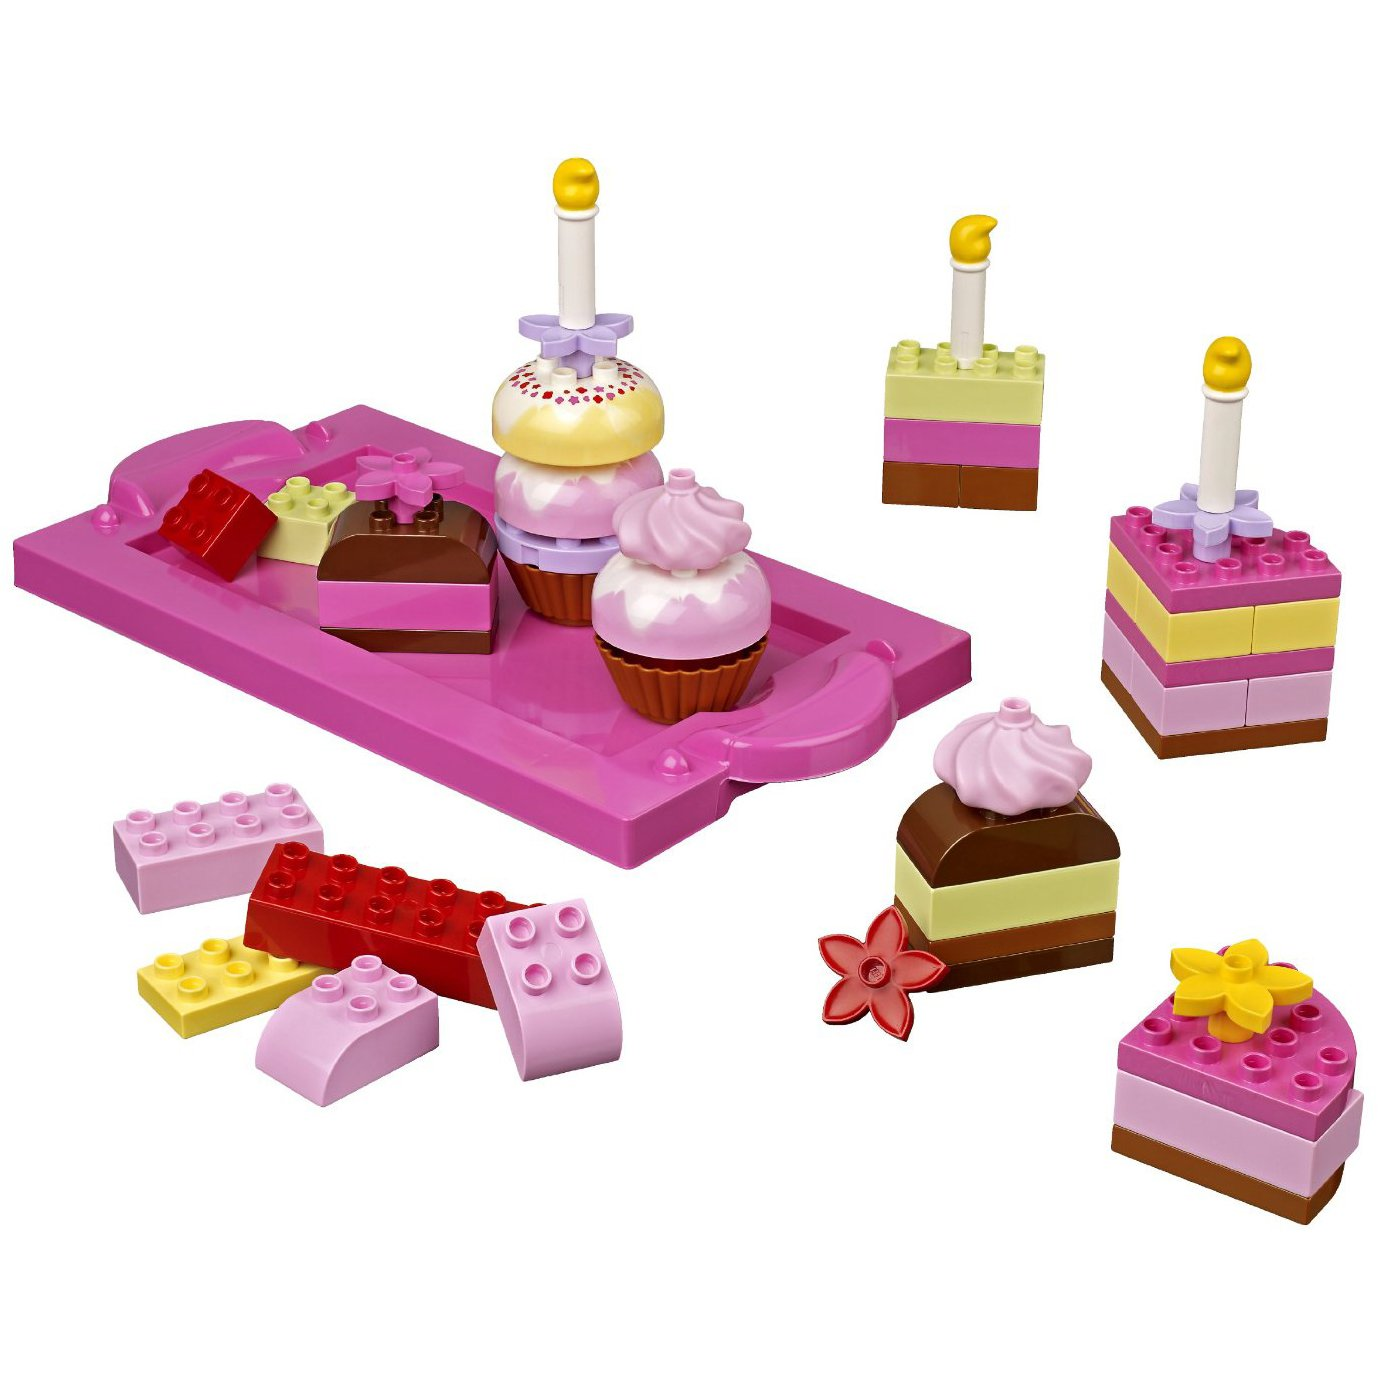 Amazoncom Lego Duplo 6785 Creative Cakes Toys Games